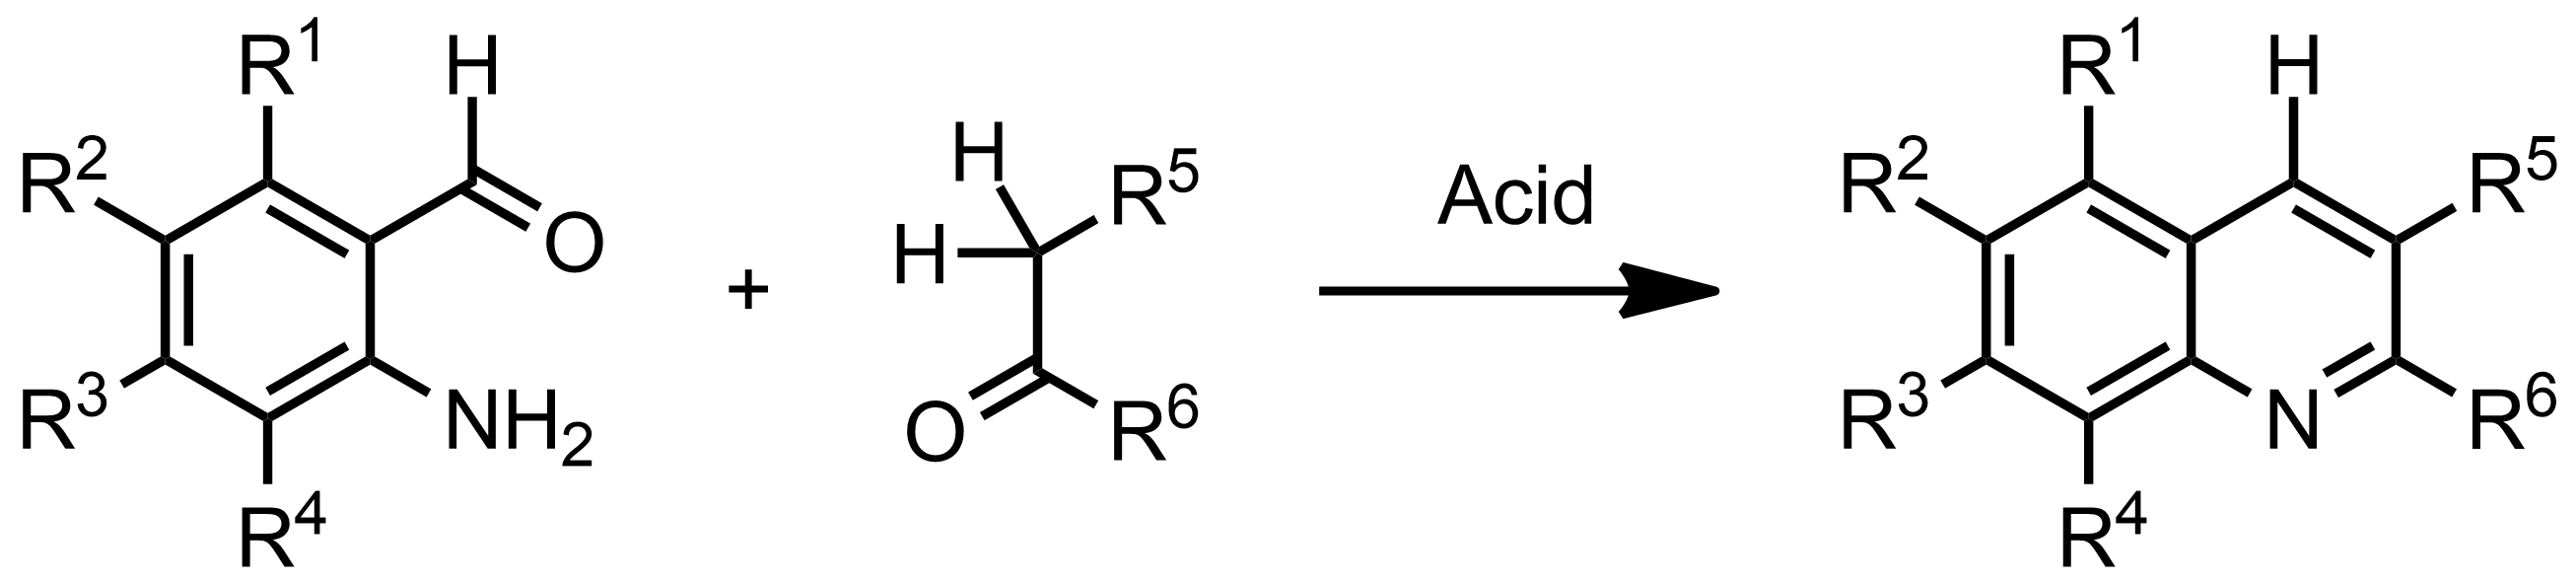 Schematic representation of the Friedländer synthesis.